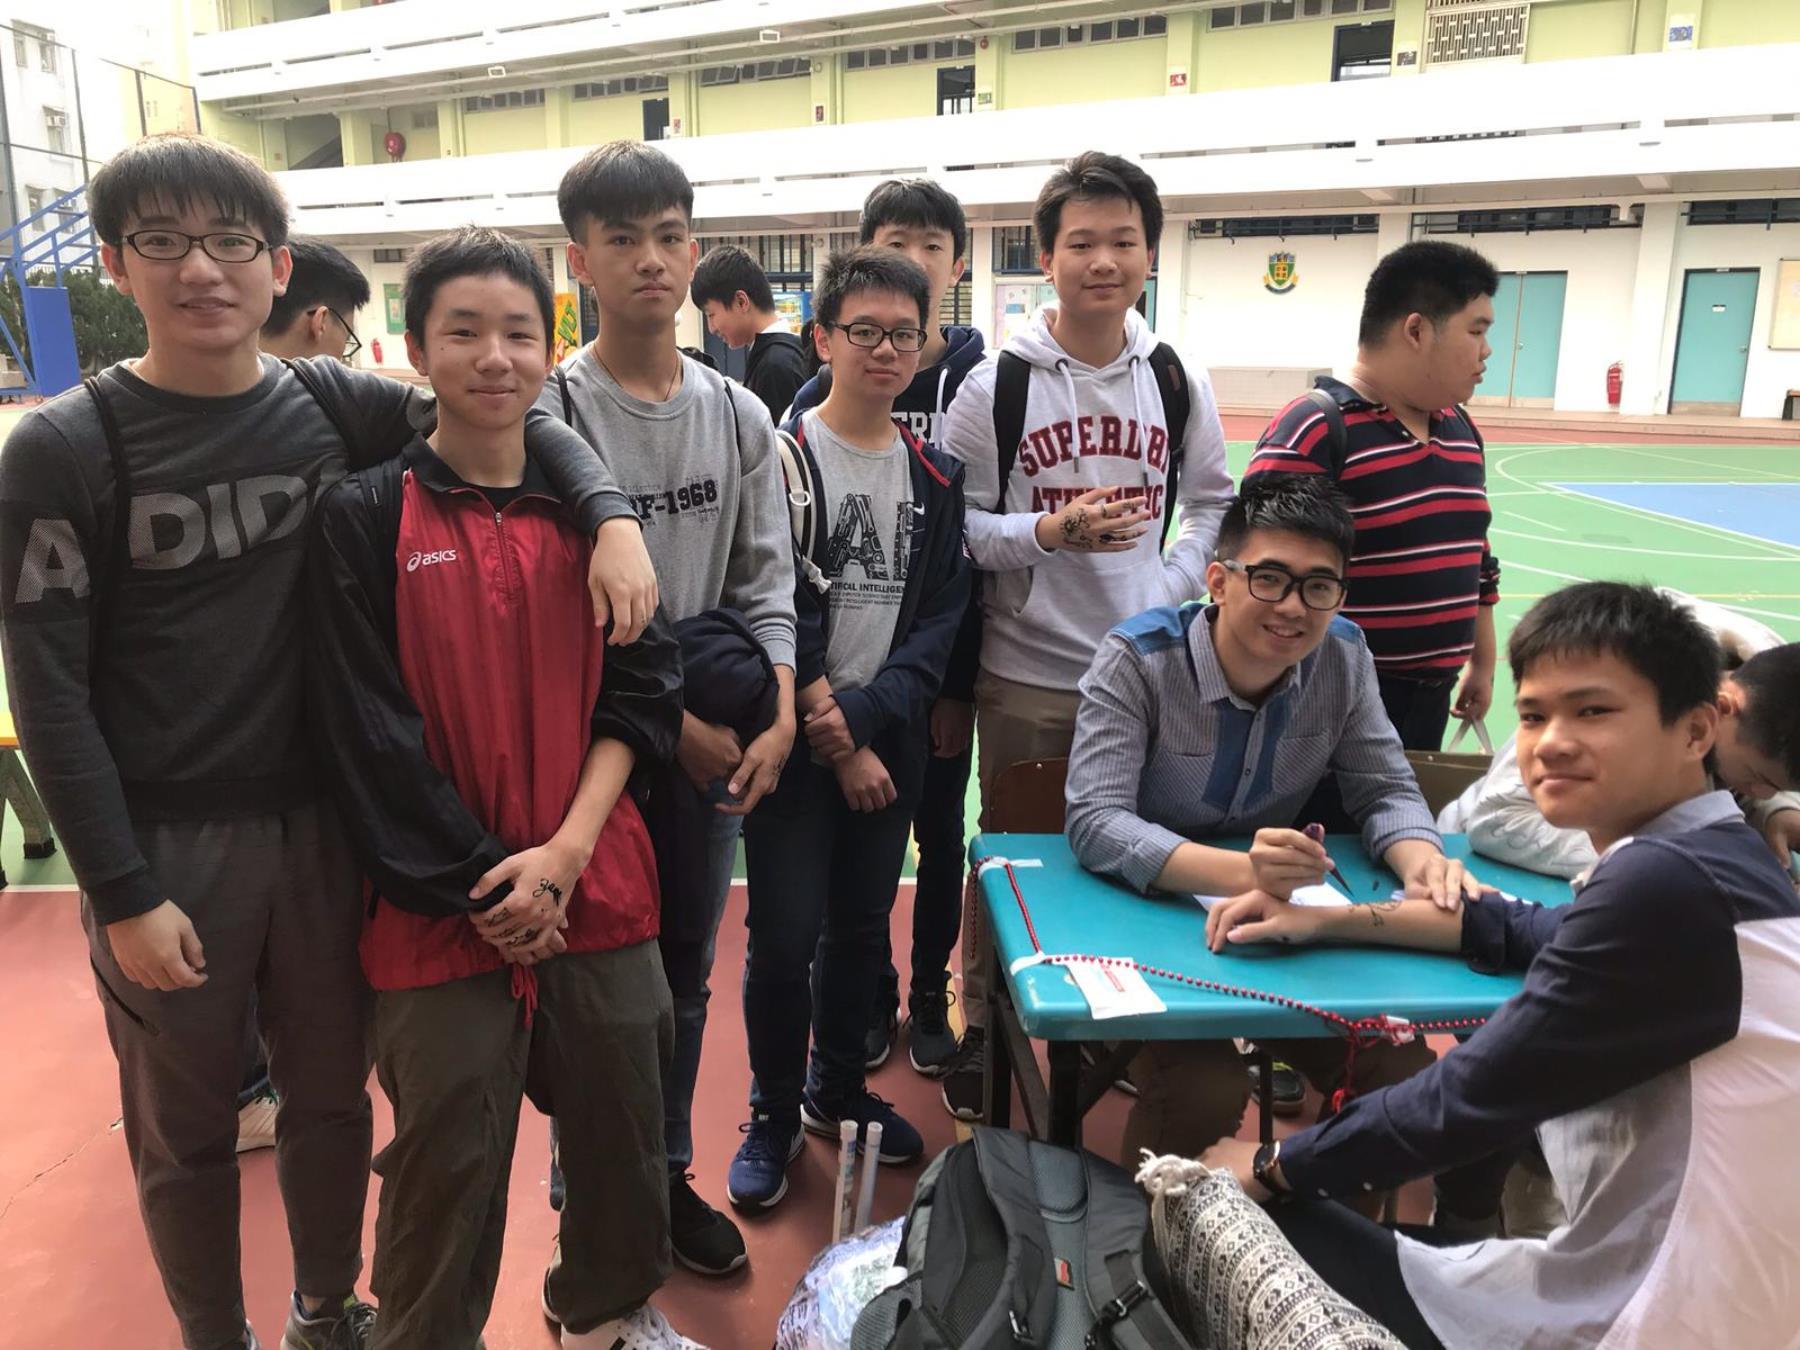 https://npc.edu.hk/sites/default/files/img-20190102-wa0010_2.jpg